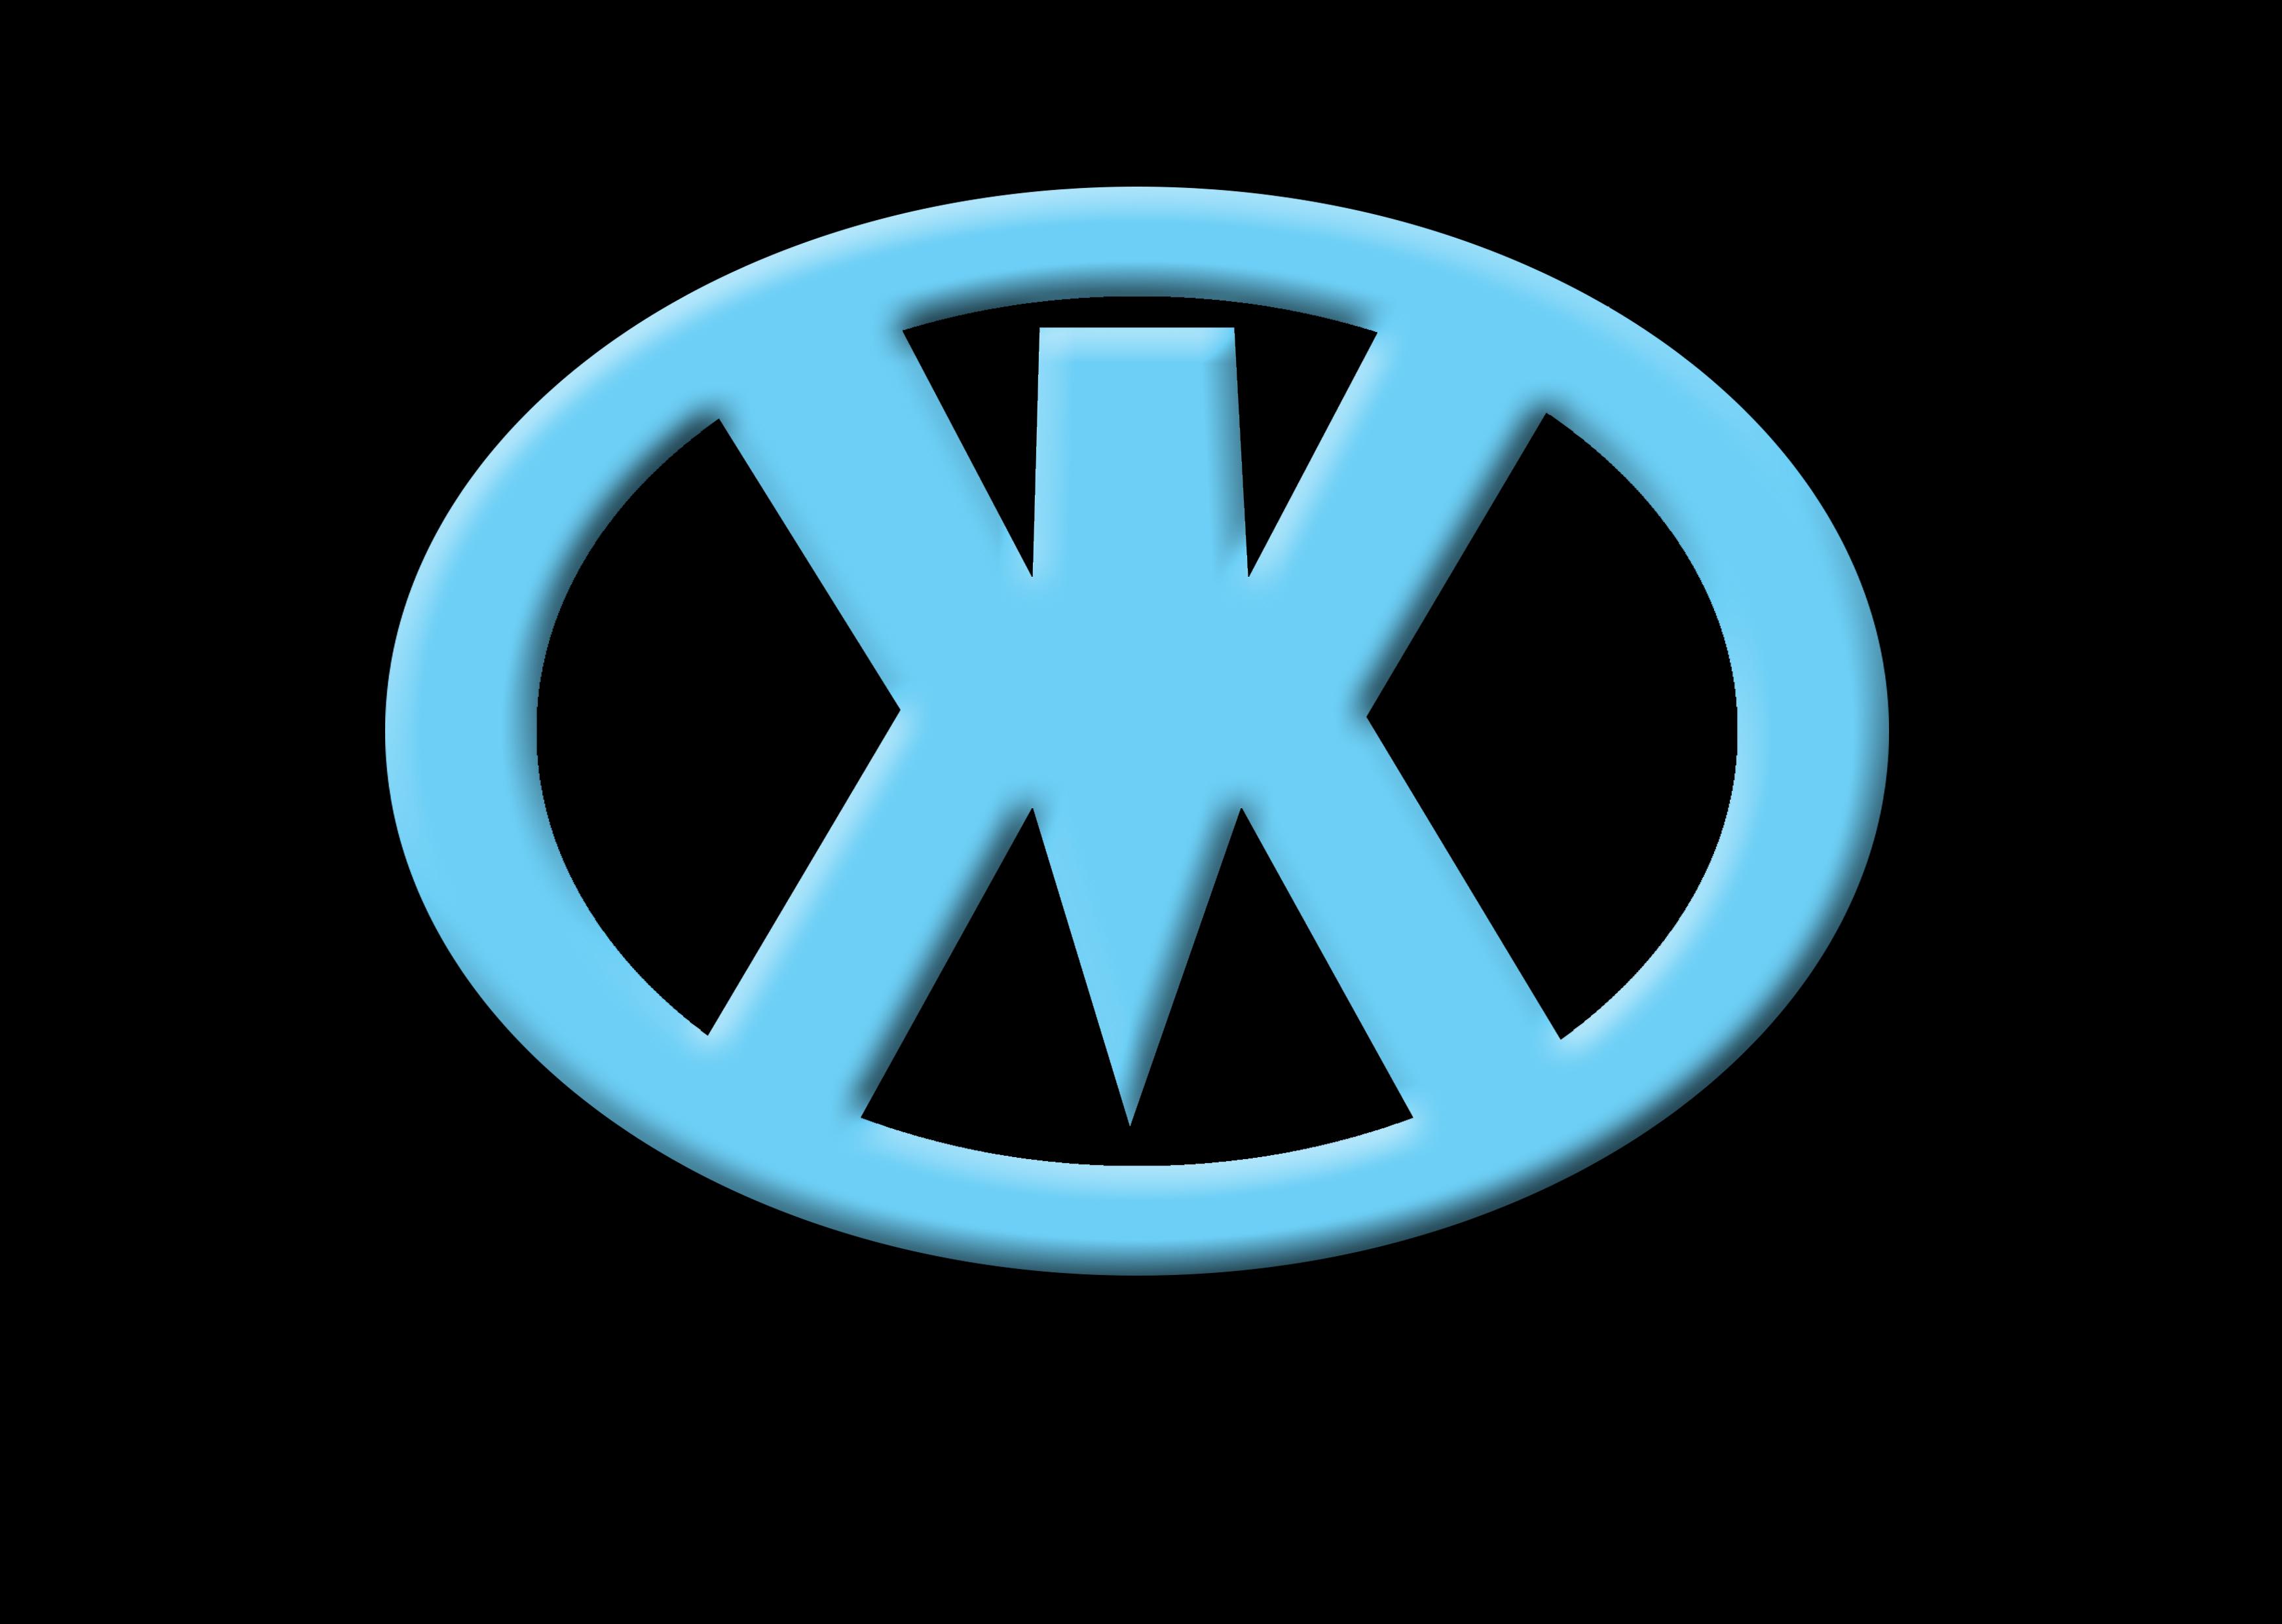 Нужен логотип (эмблема) для самодельного квадроцикла фото f_3865afc37754470b.jpg